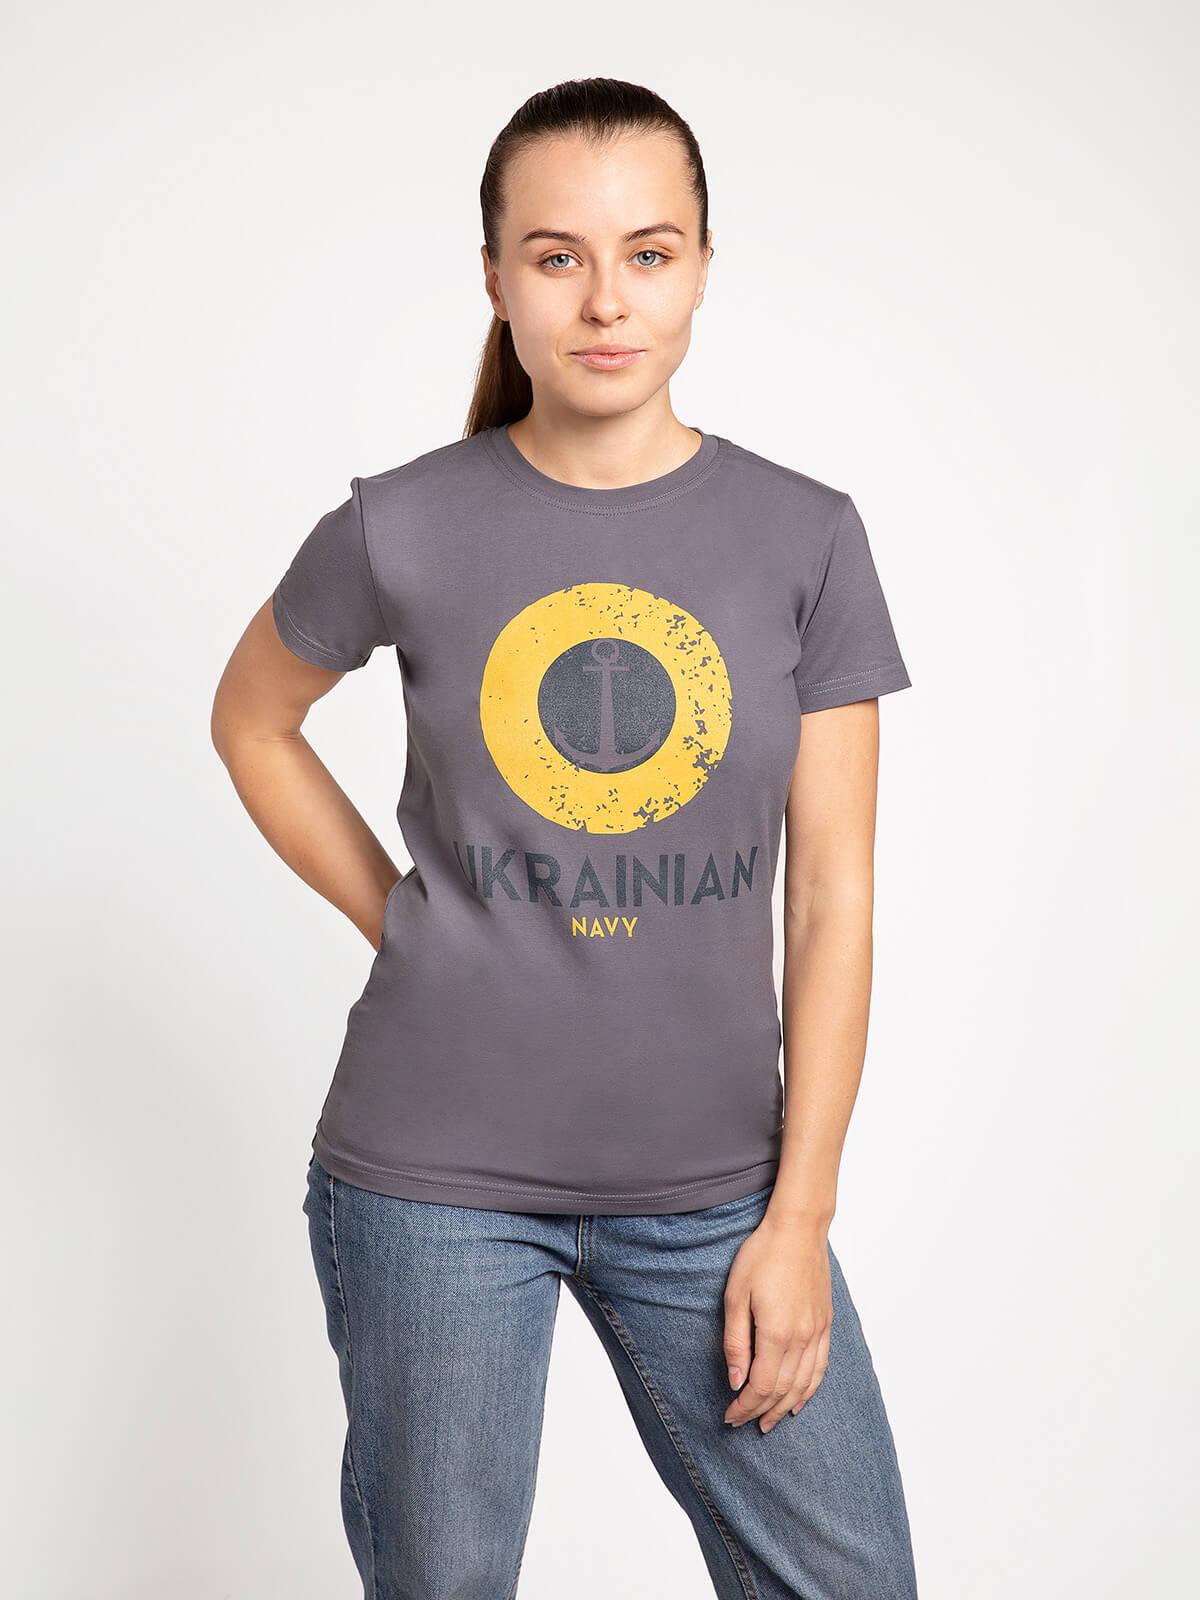 Women's T-Shirt Ukrainian Navy. Color gray. Material: 95% cotton, 5% spandex.